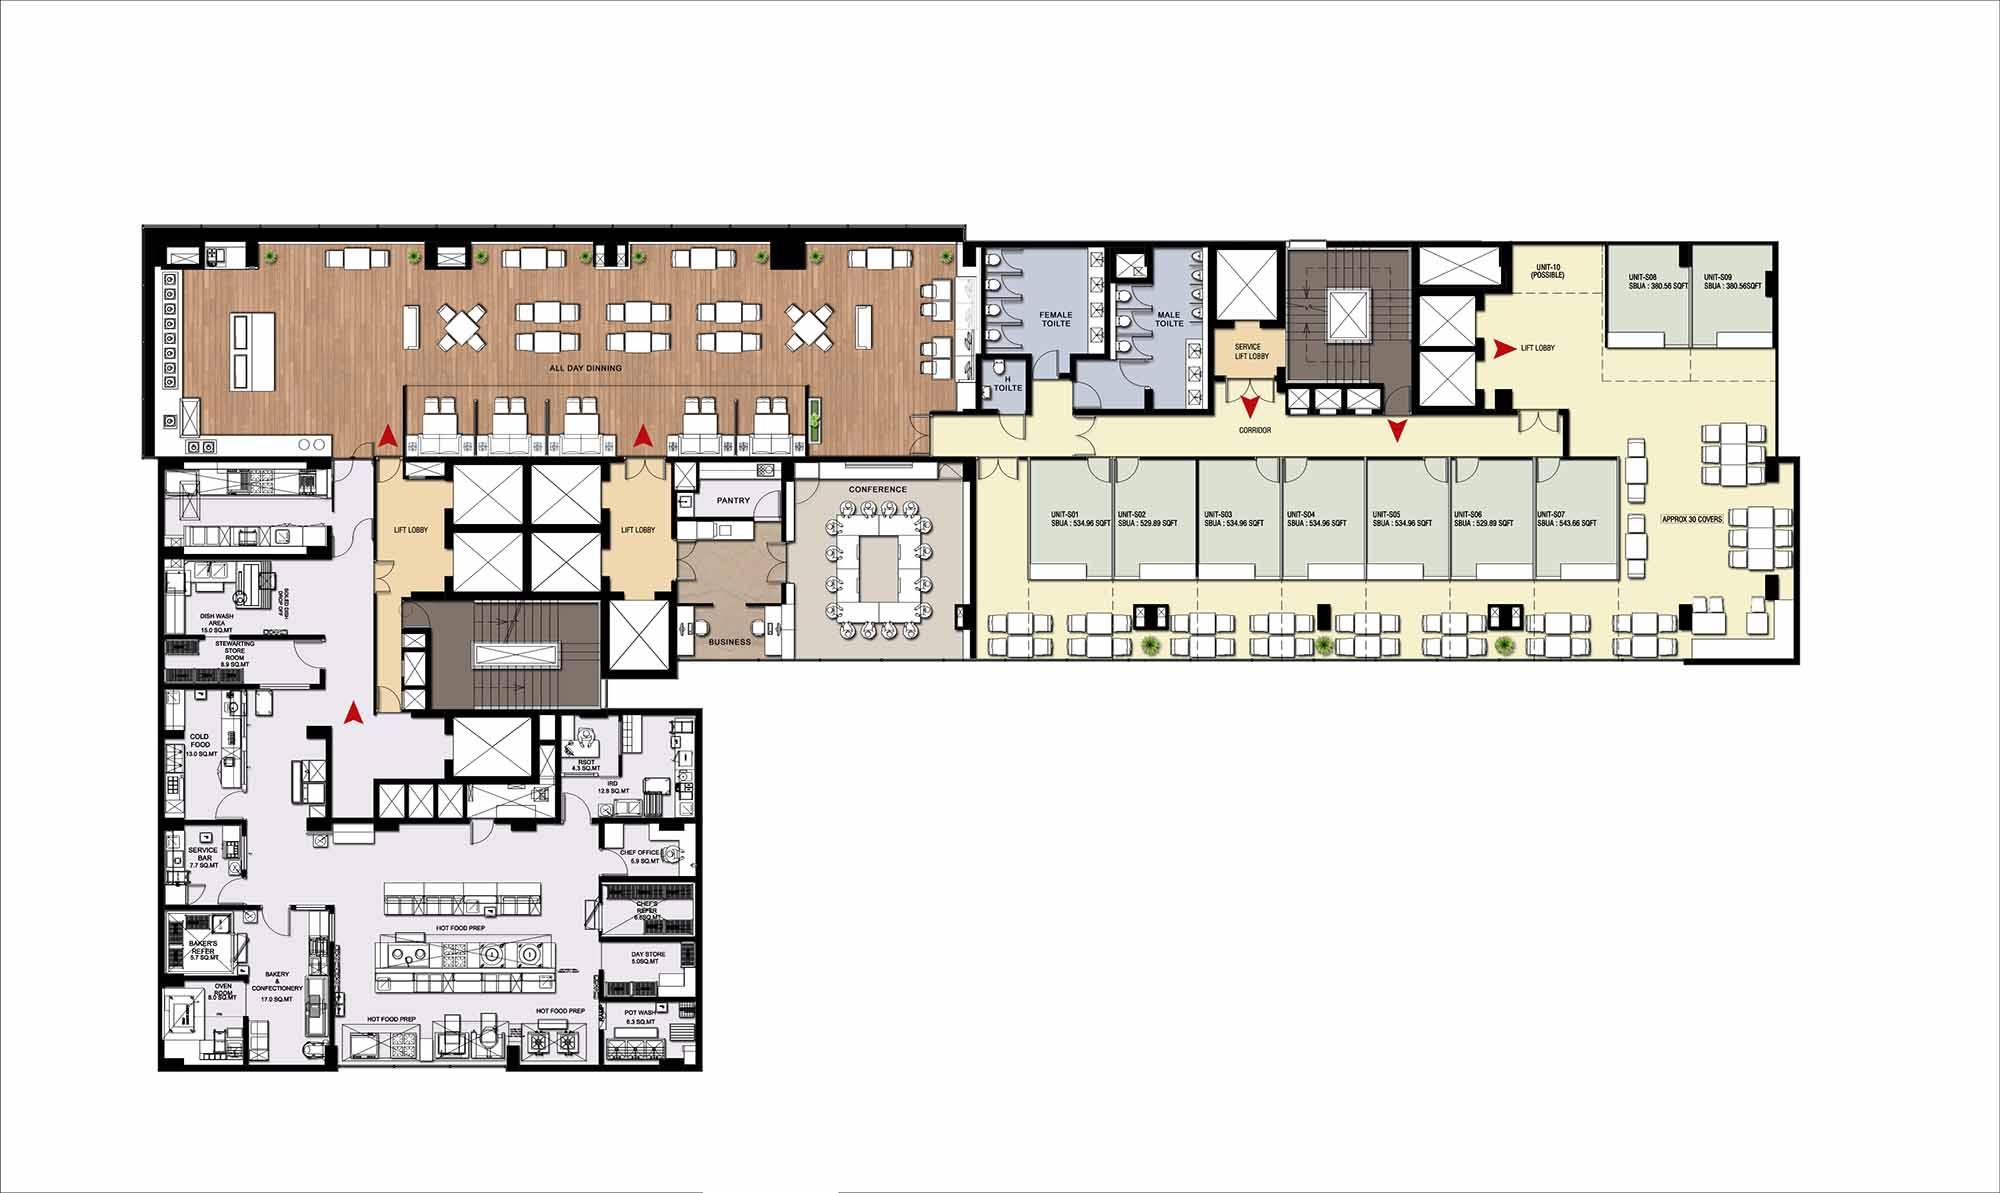 Burman gsc spectra plaza sector 82a nh8 gurgaon for Landcraft homes floor plans